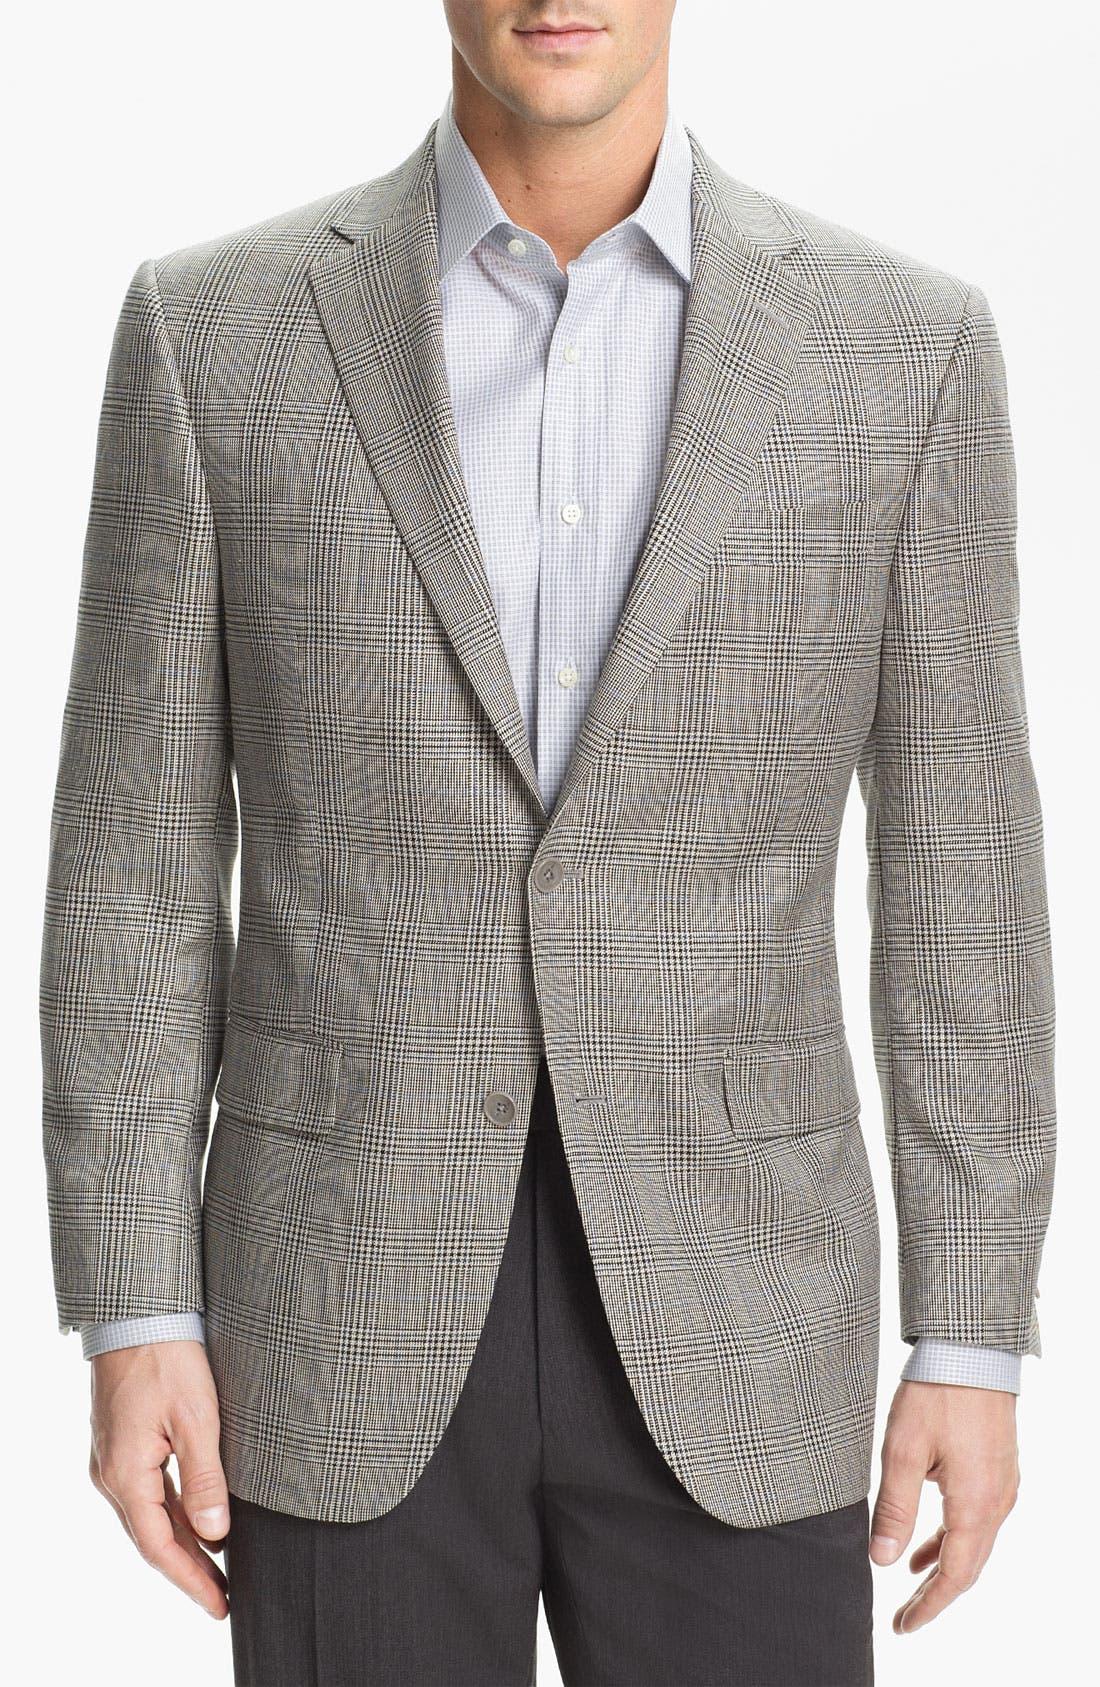 Alternate Image 1 Selected - Hart Schaffner Marx Plaid Sportcoat